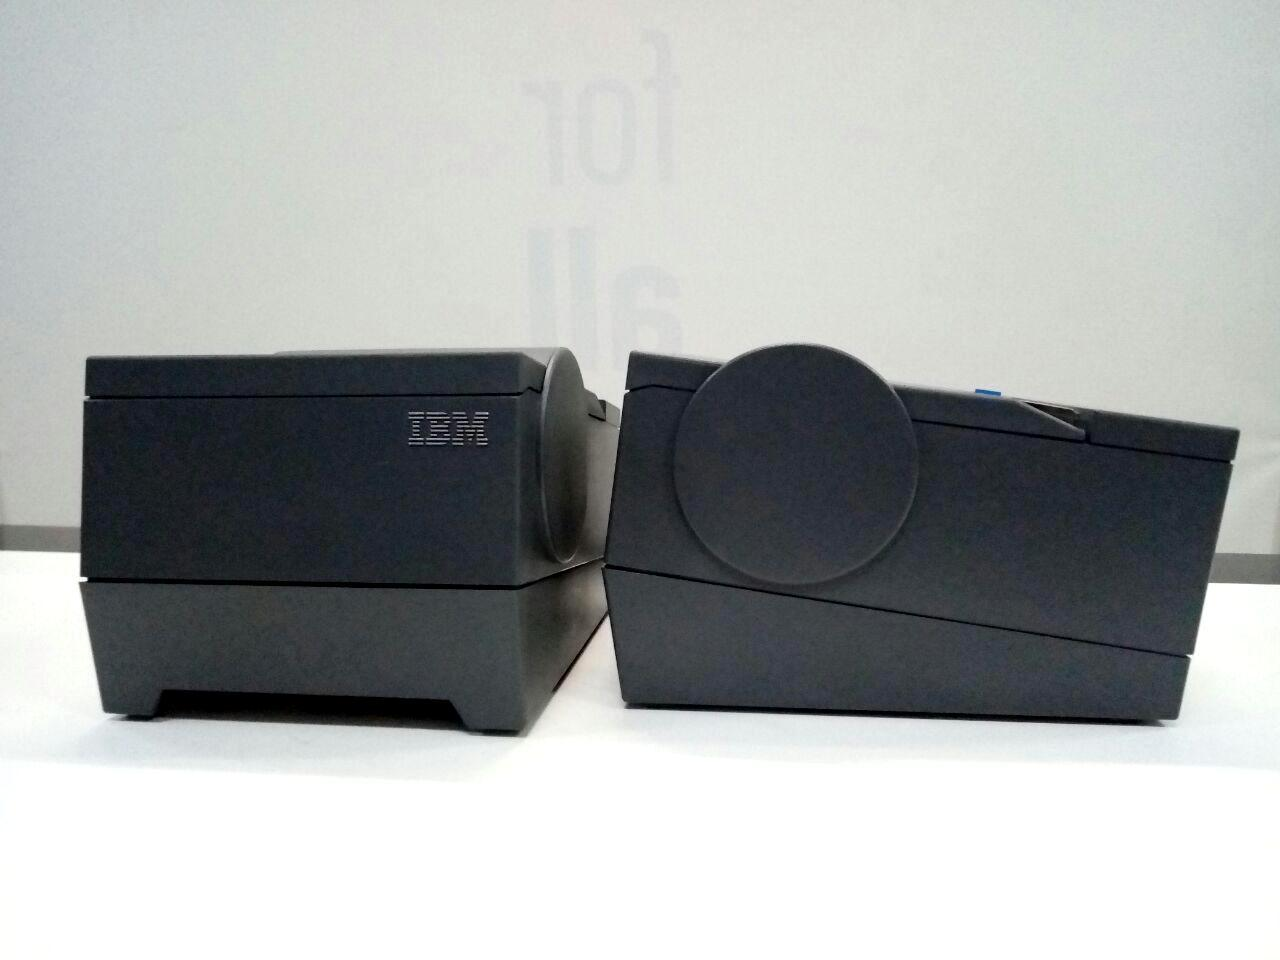 Чековый принтер DELL type 4610-TF6